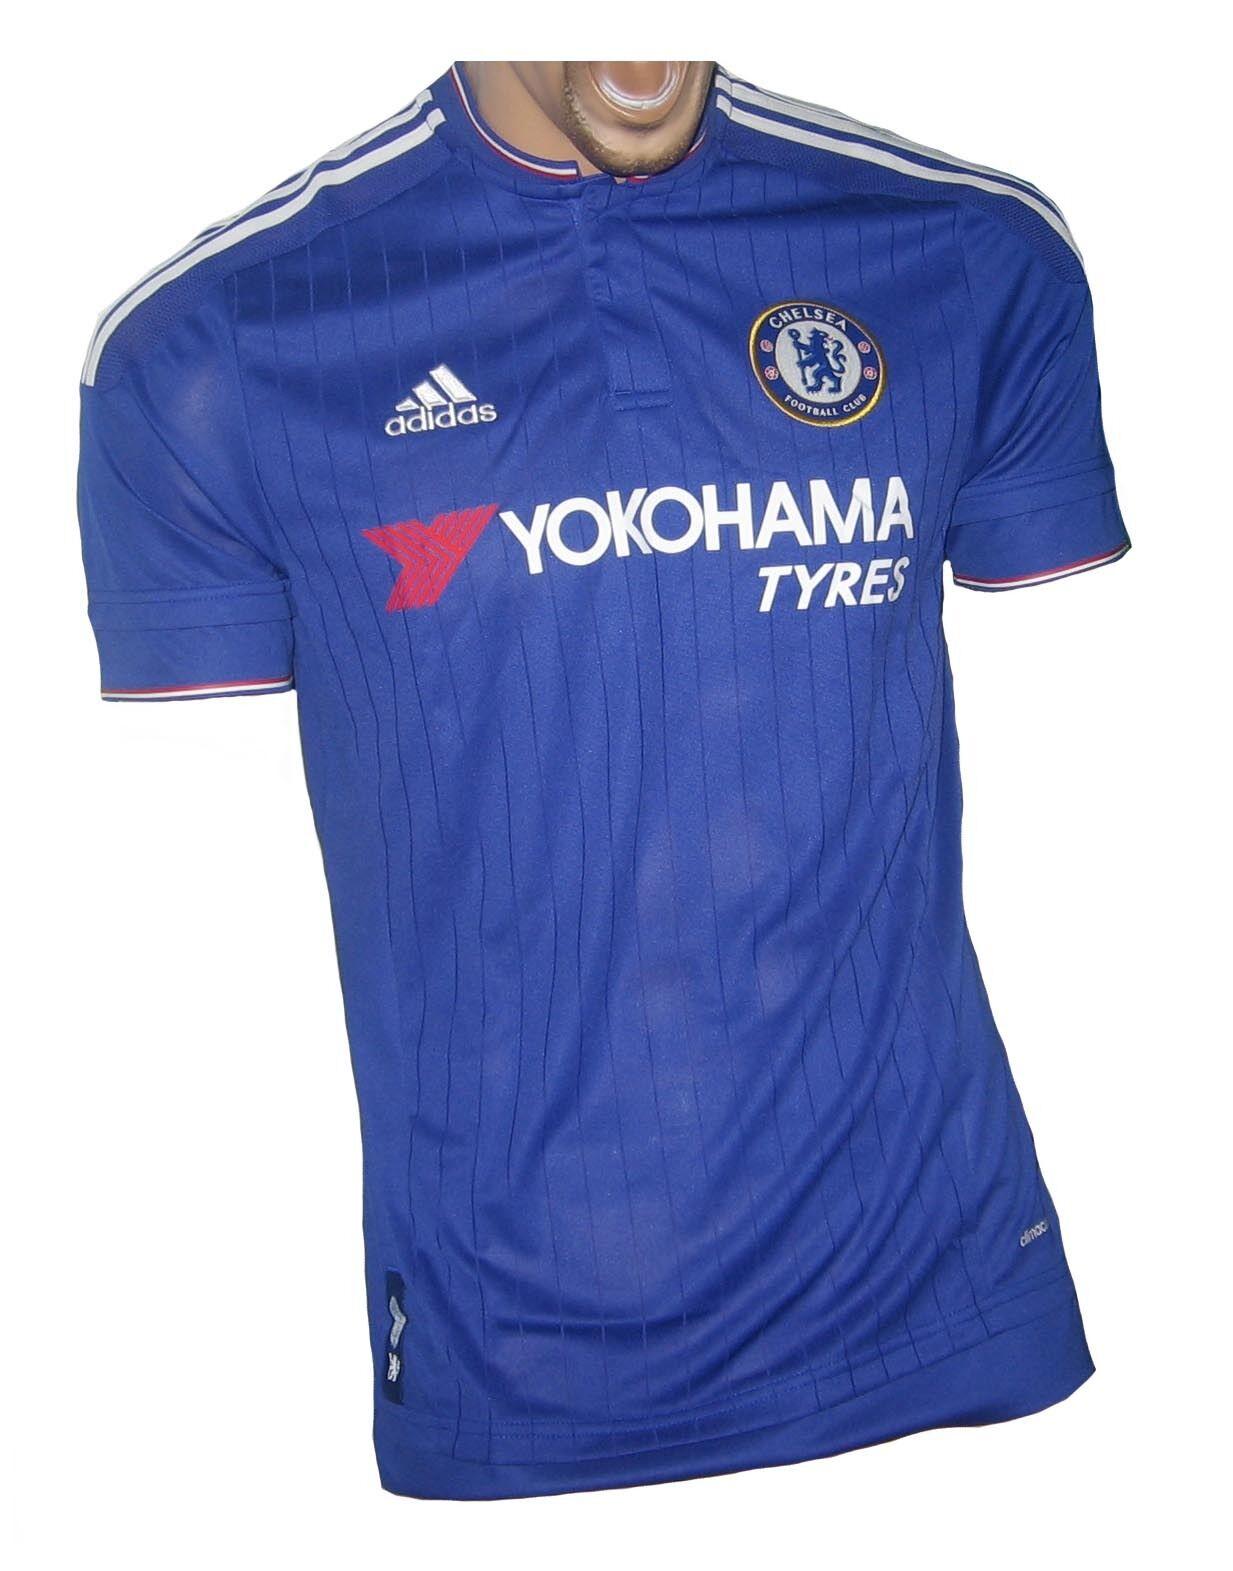 Chelsea London London London FC Trikot Home 2015 16 Adidas e59d20